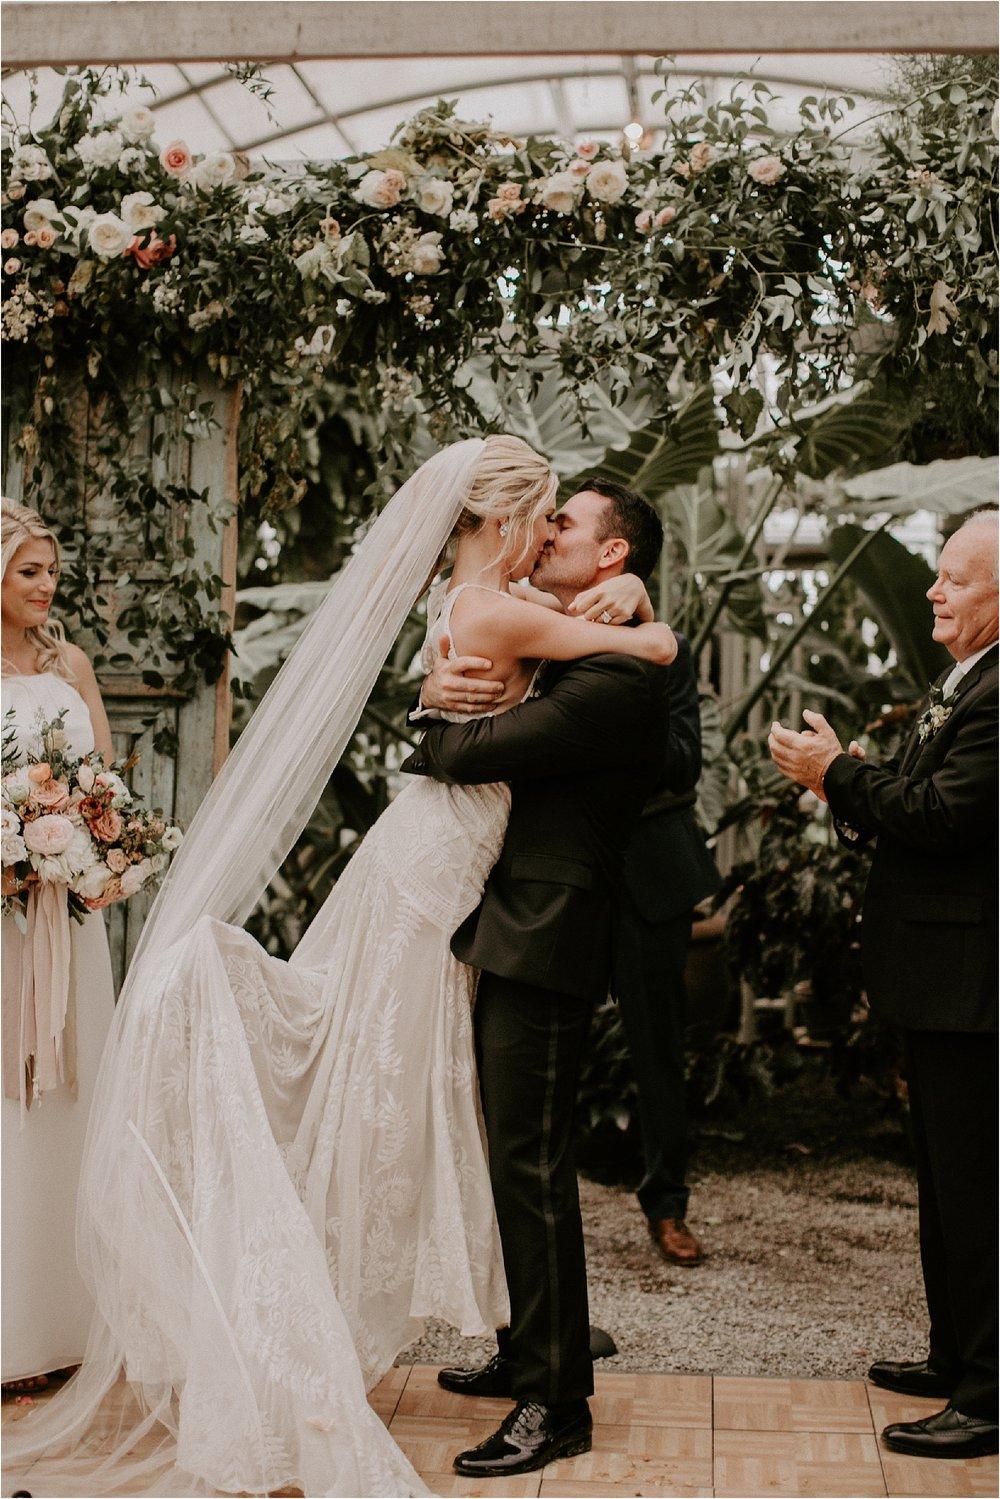 Sarah_Brookhart_Hortulus_Farm_Garden_and_Nursey_Wedding_Photographer_0049.jpg